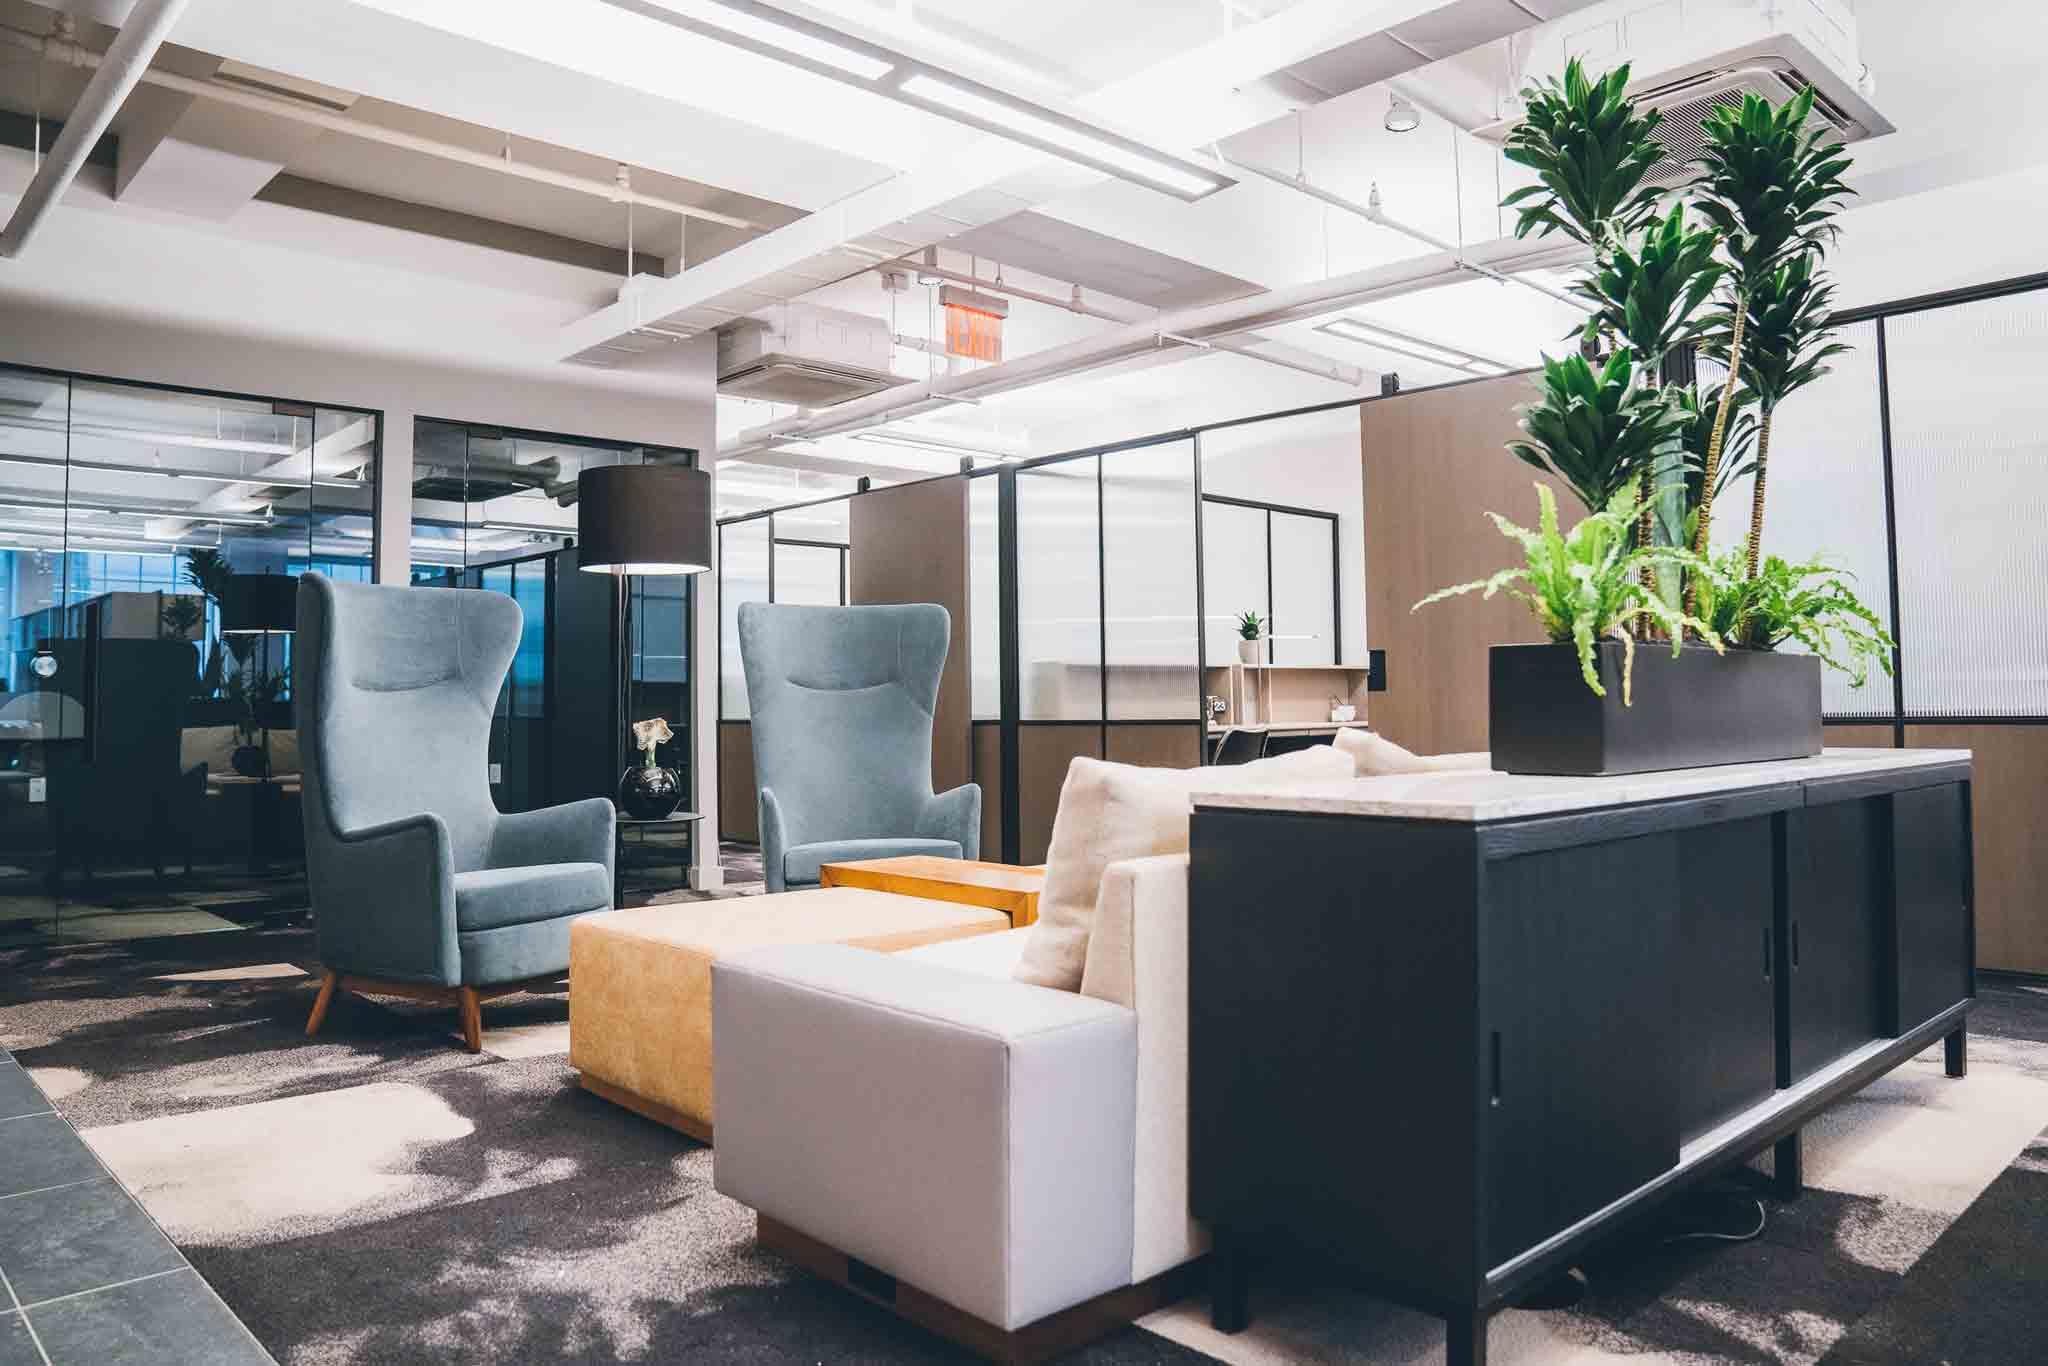 floor-lounge-chairs.jpg